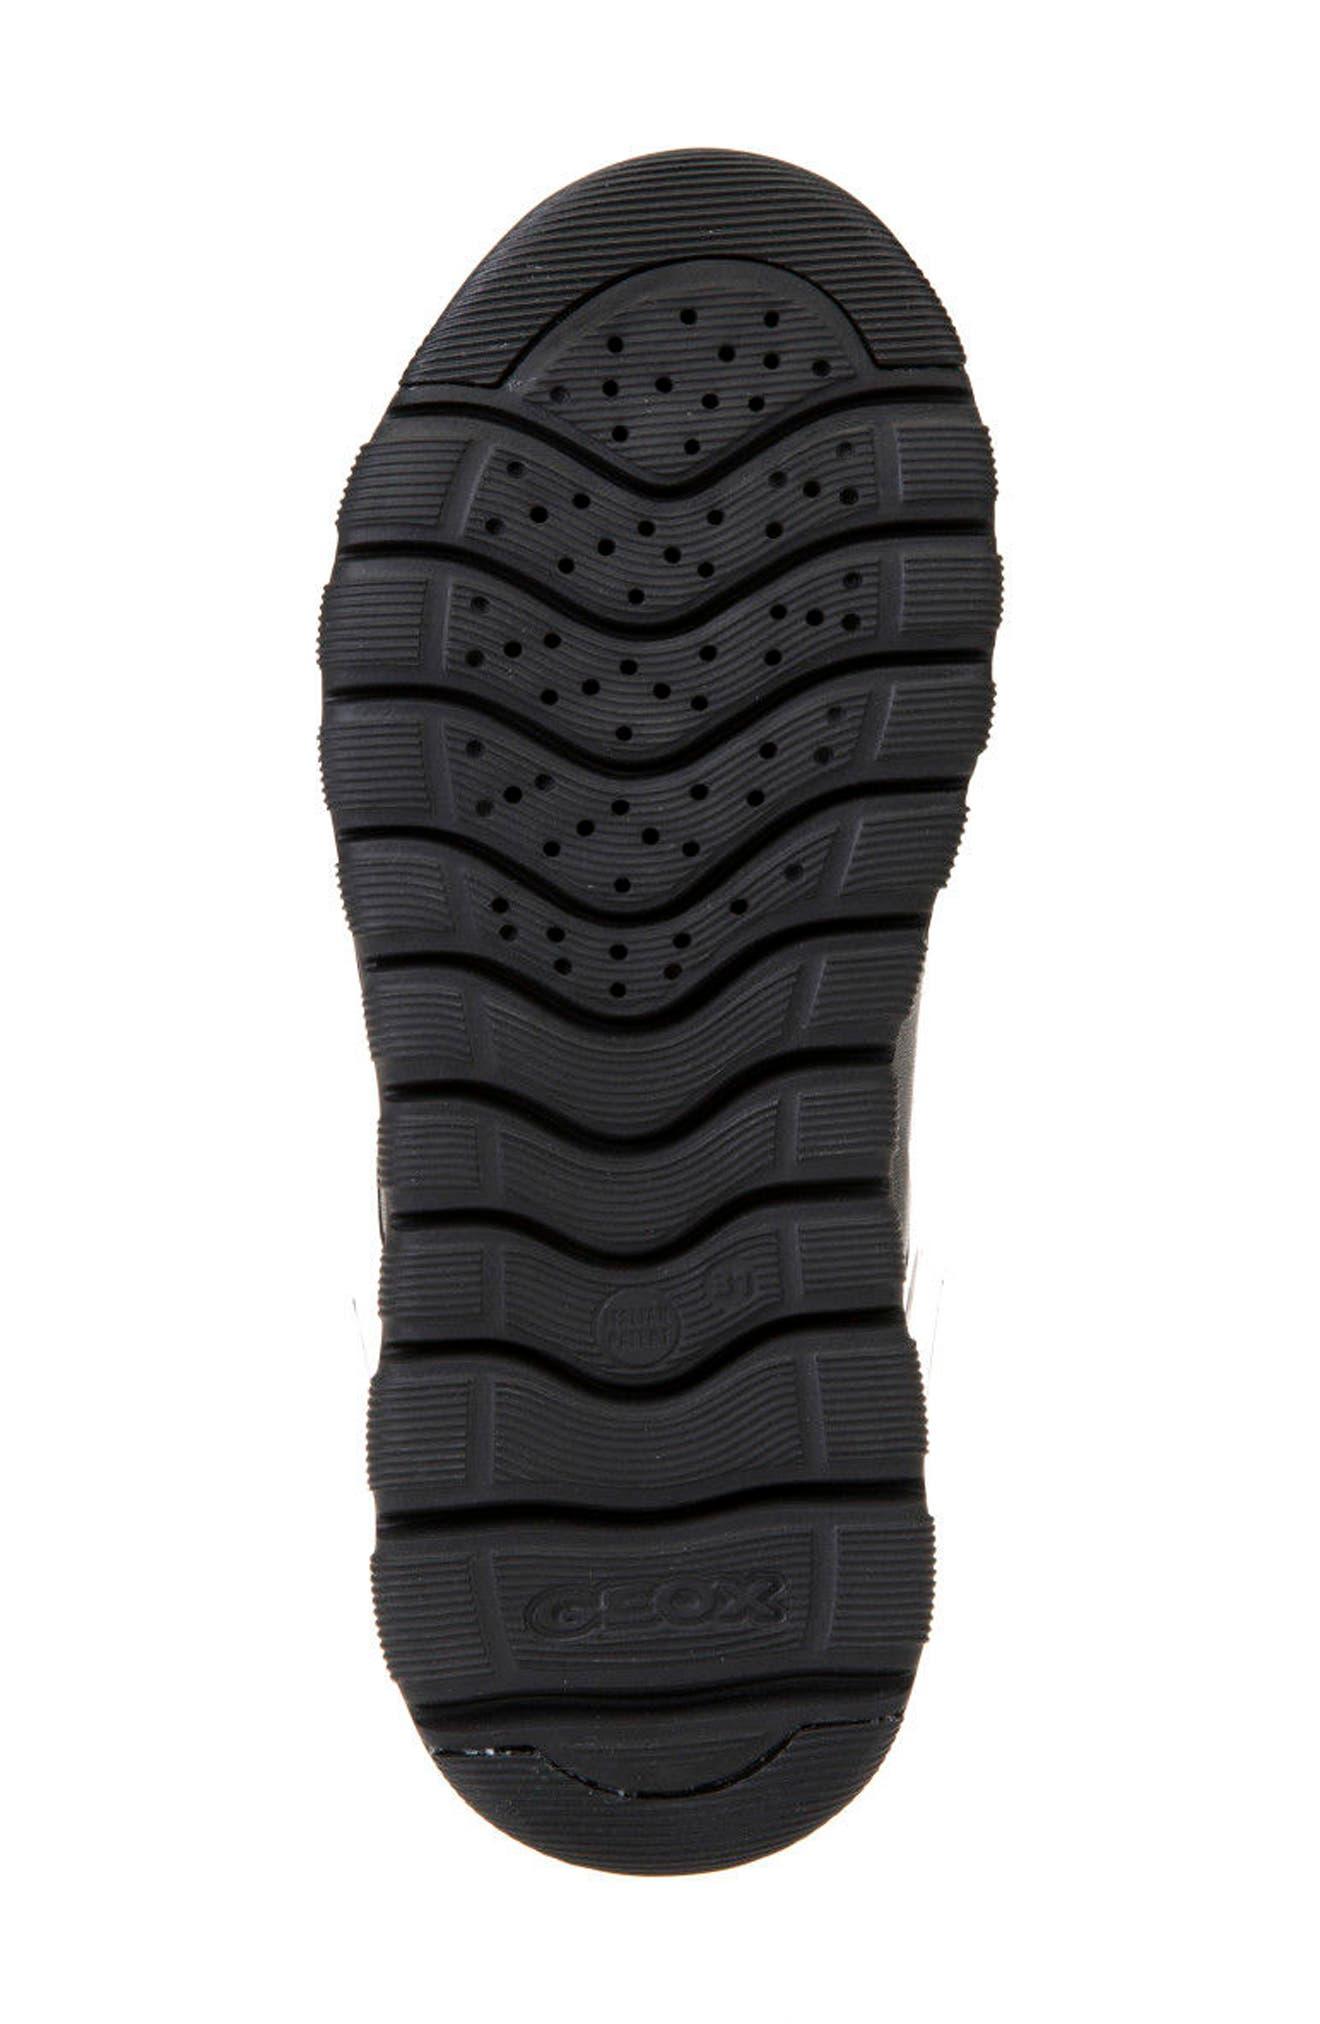 Xunday Low Top Sneaker,                             Alternate thumbnail 6, color,                             BLACK